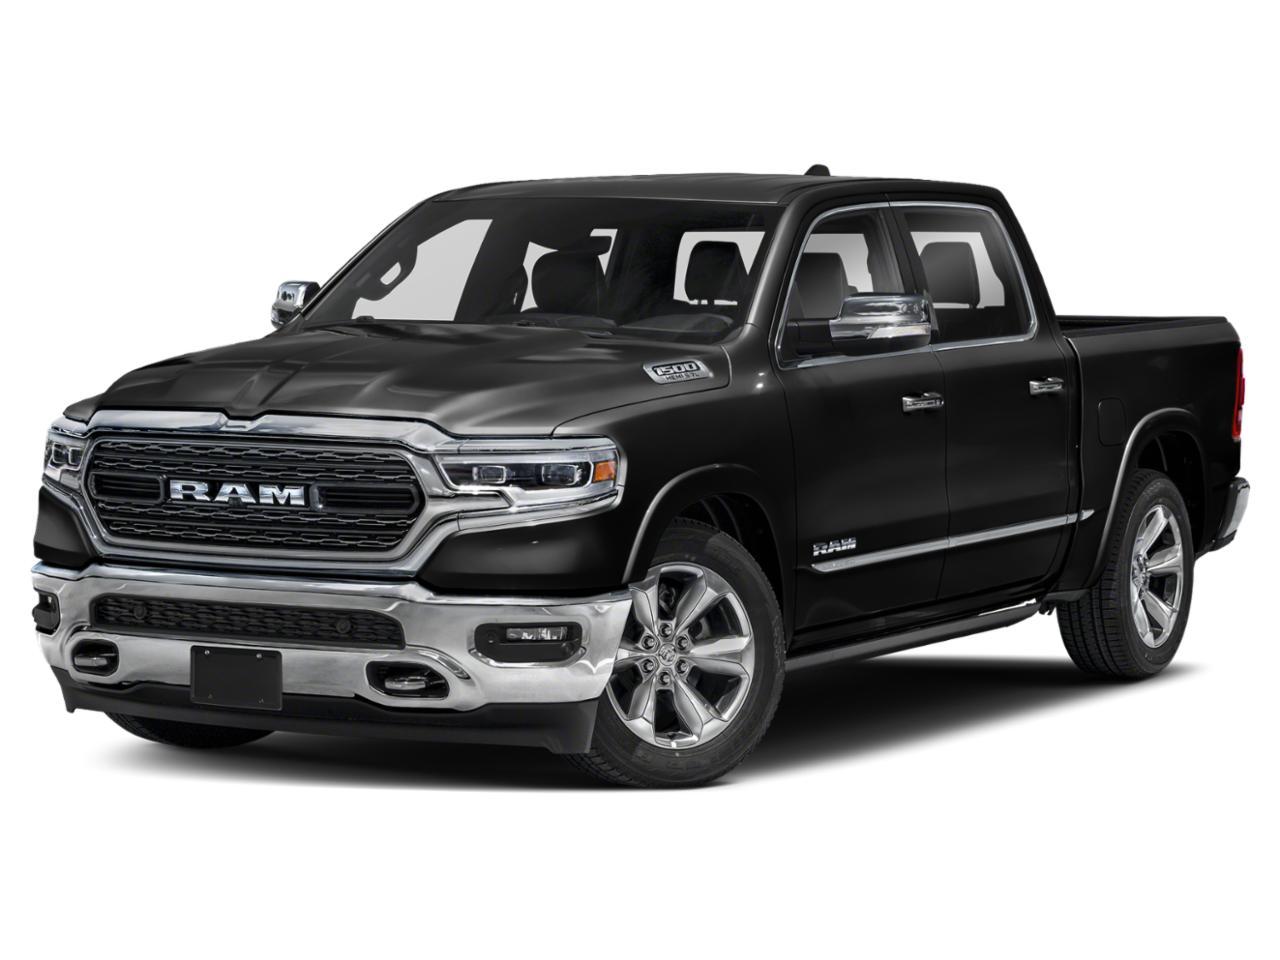 2019 Ram 1500 Vehicle Photo in San Antonio, TX 78209